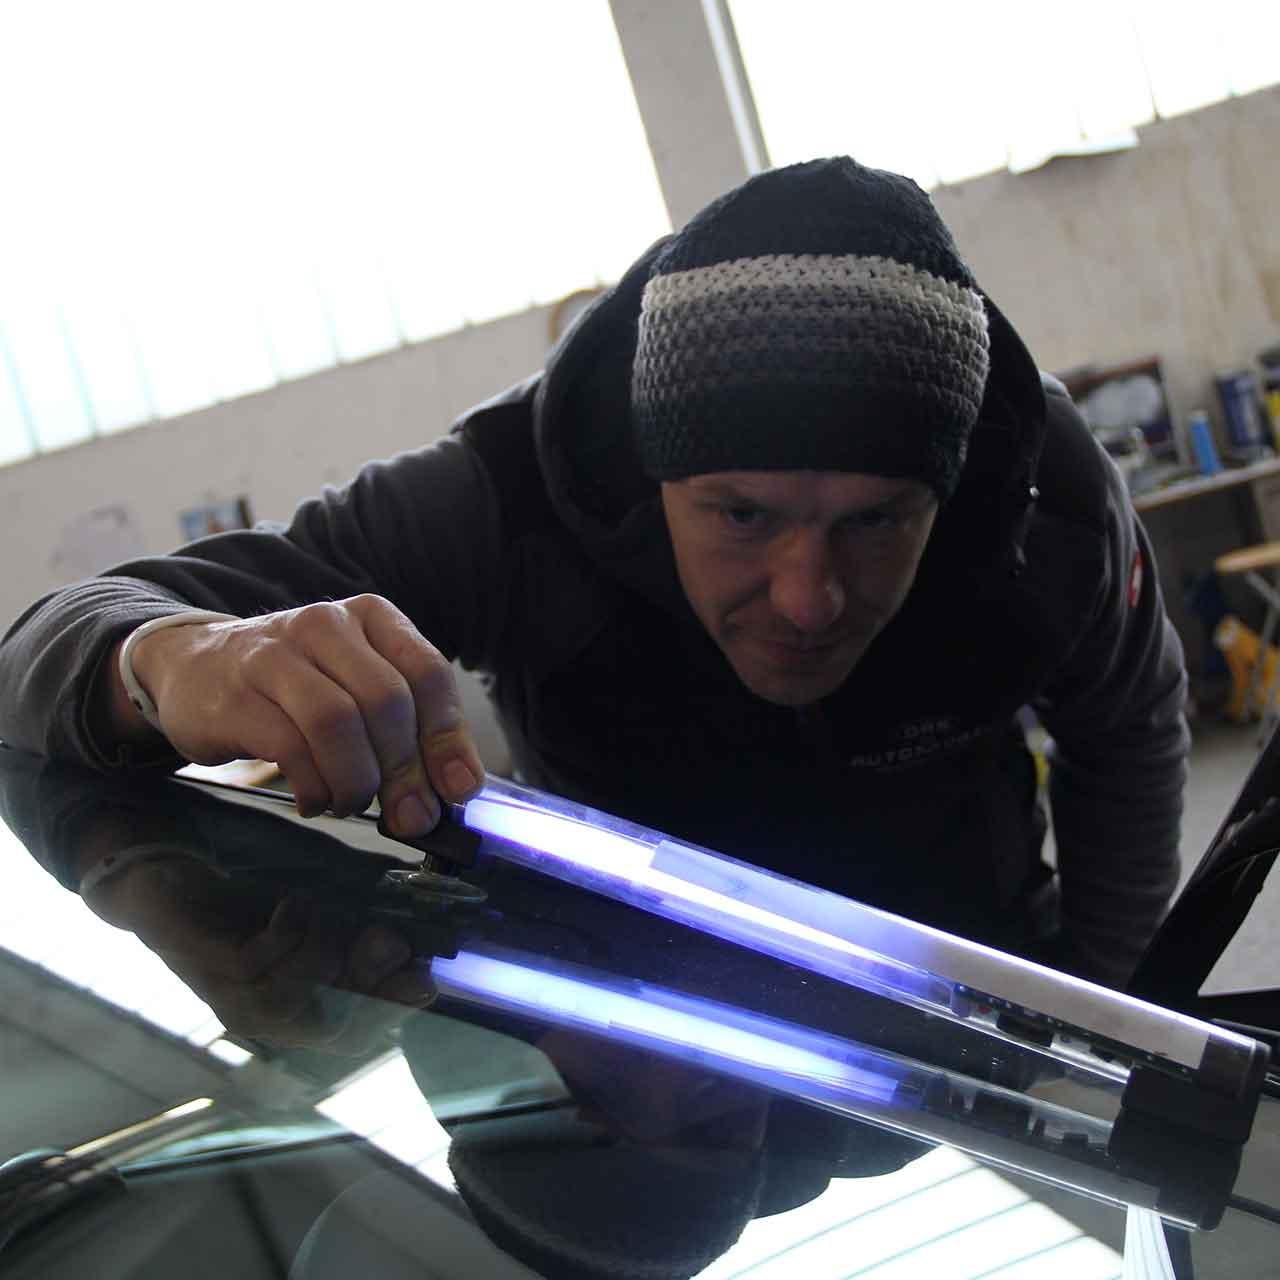 autoglas-steinschaden-reparatur-das-automobil